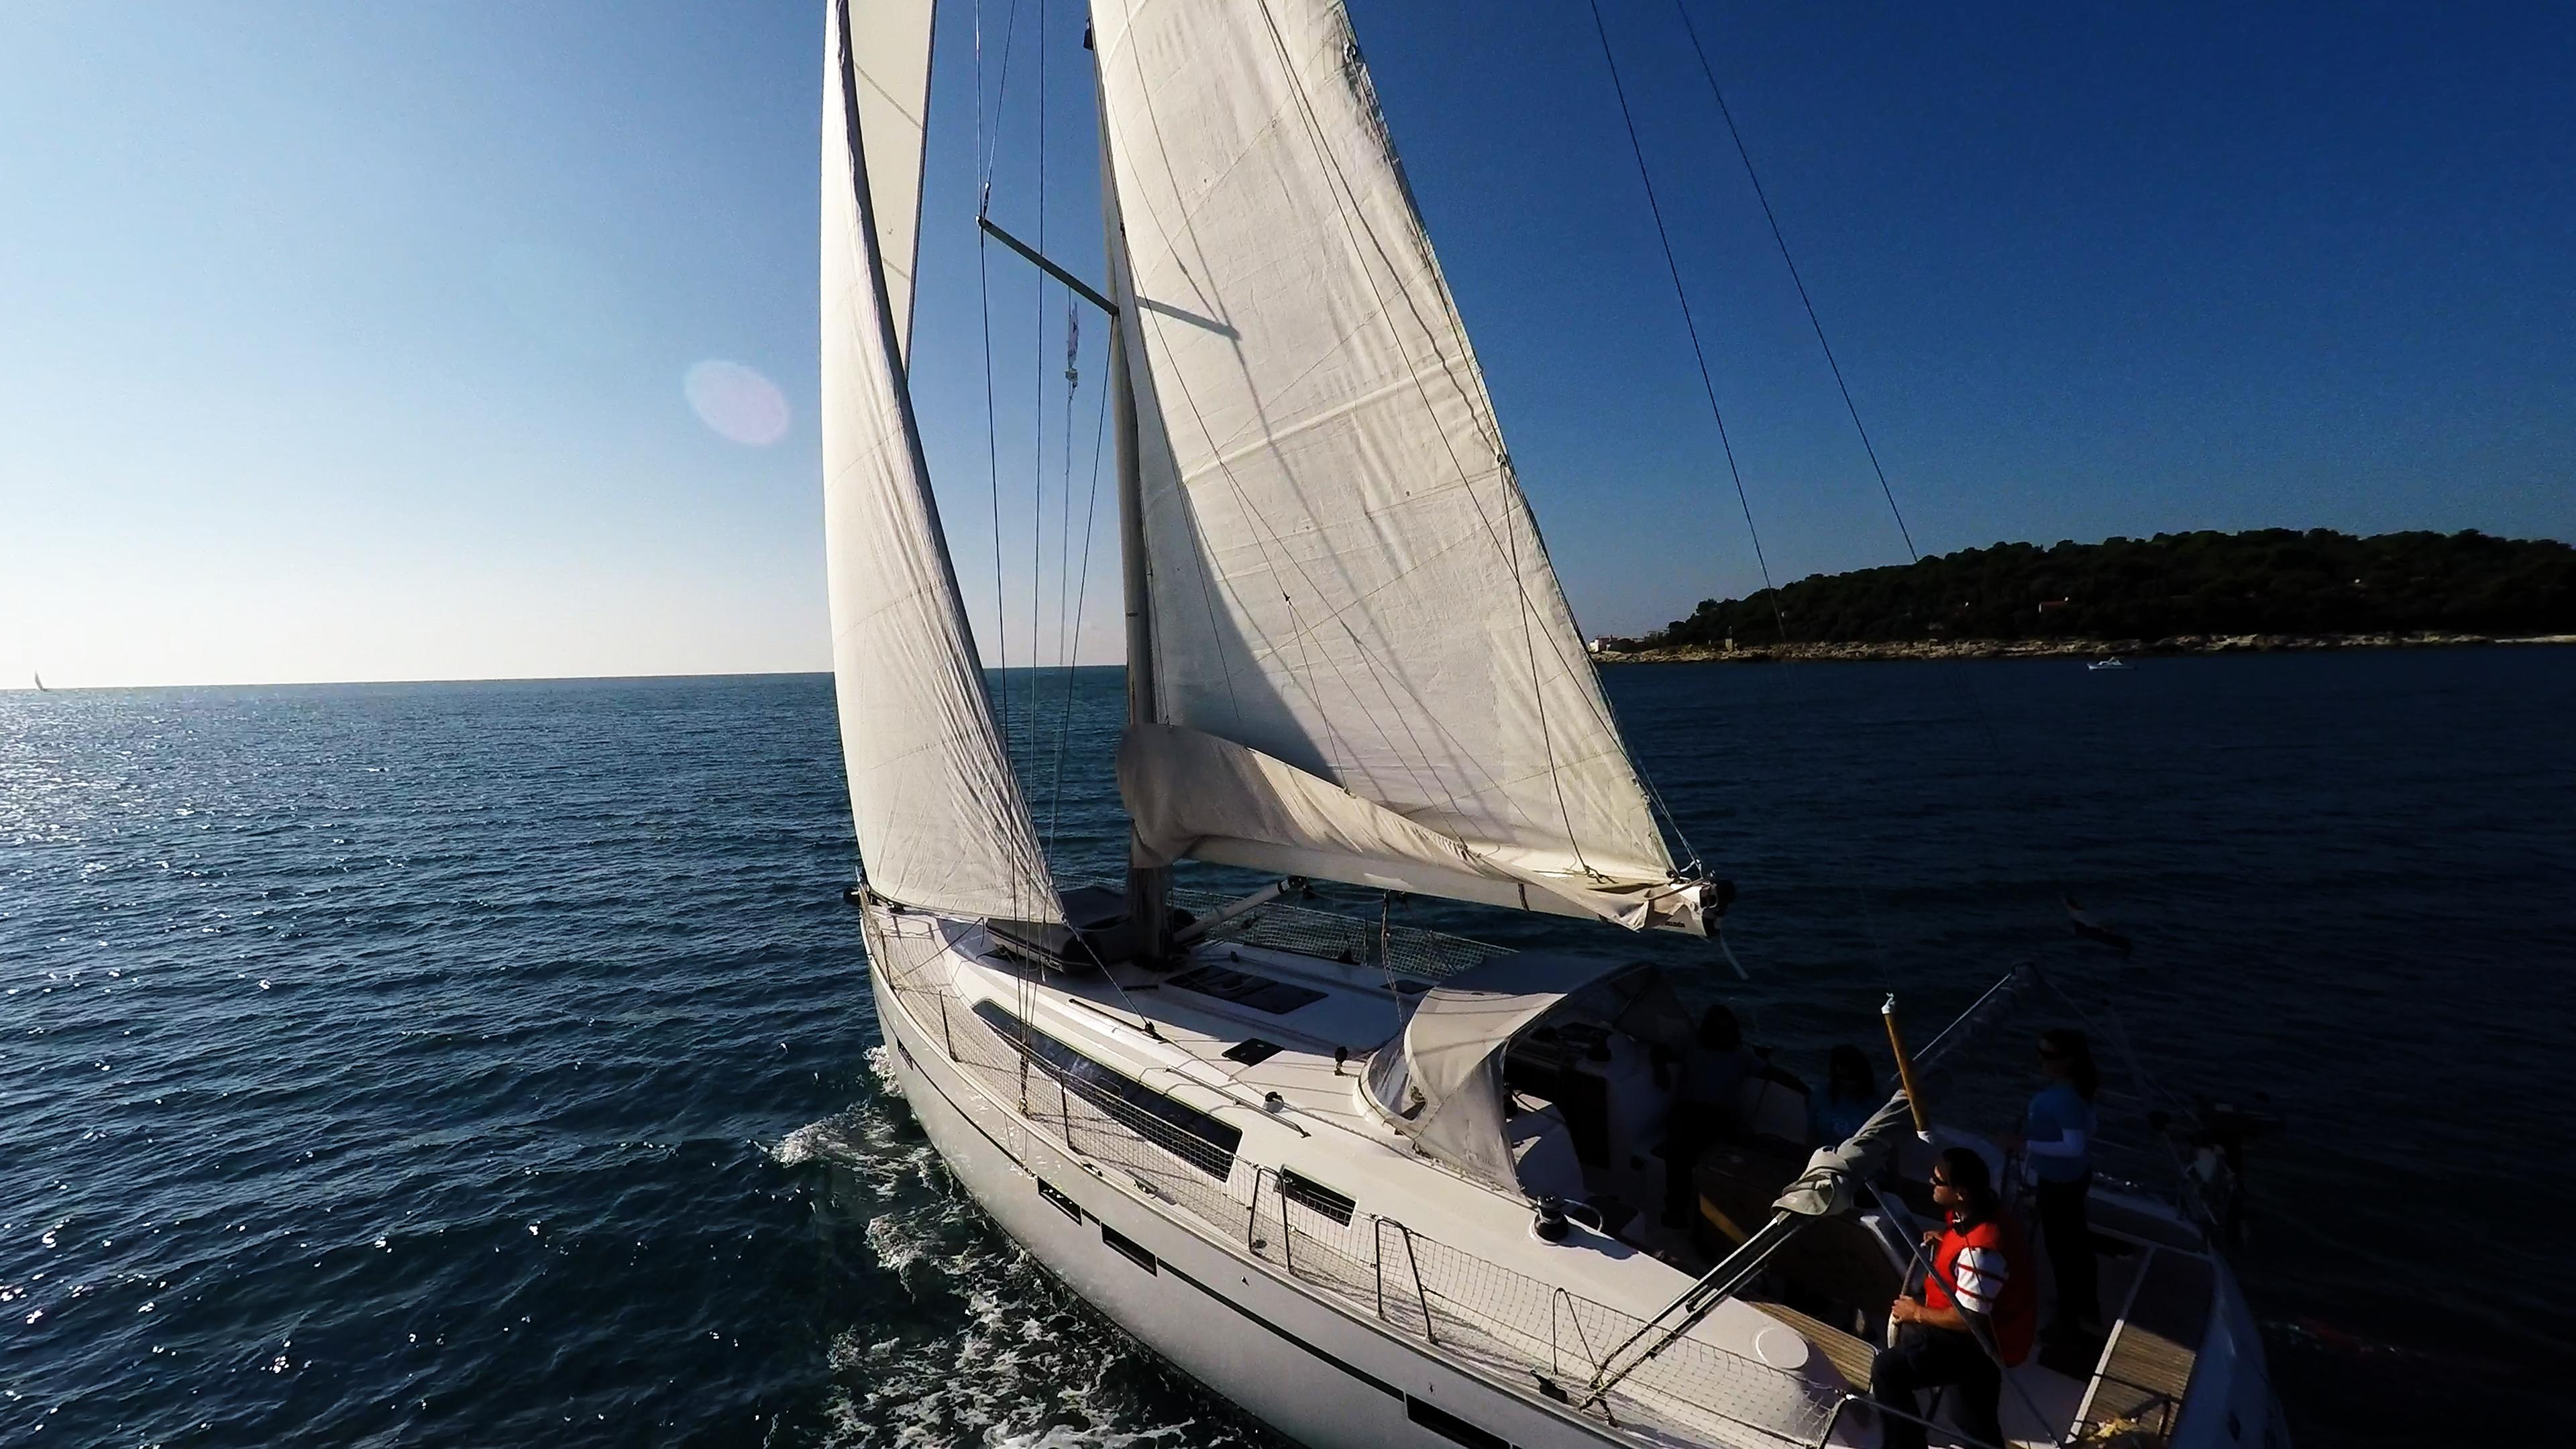 barcha a vela barca a vela yacht a vela bavaria 46 cruiser skipper equipaggio pozzetto